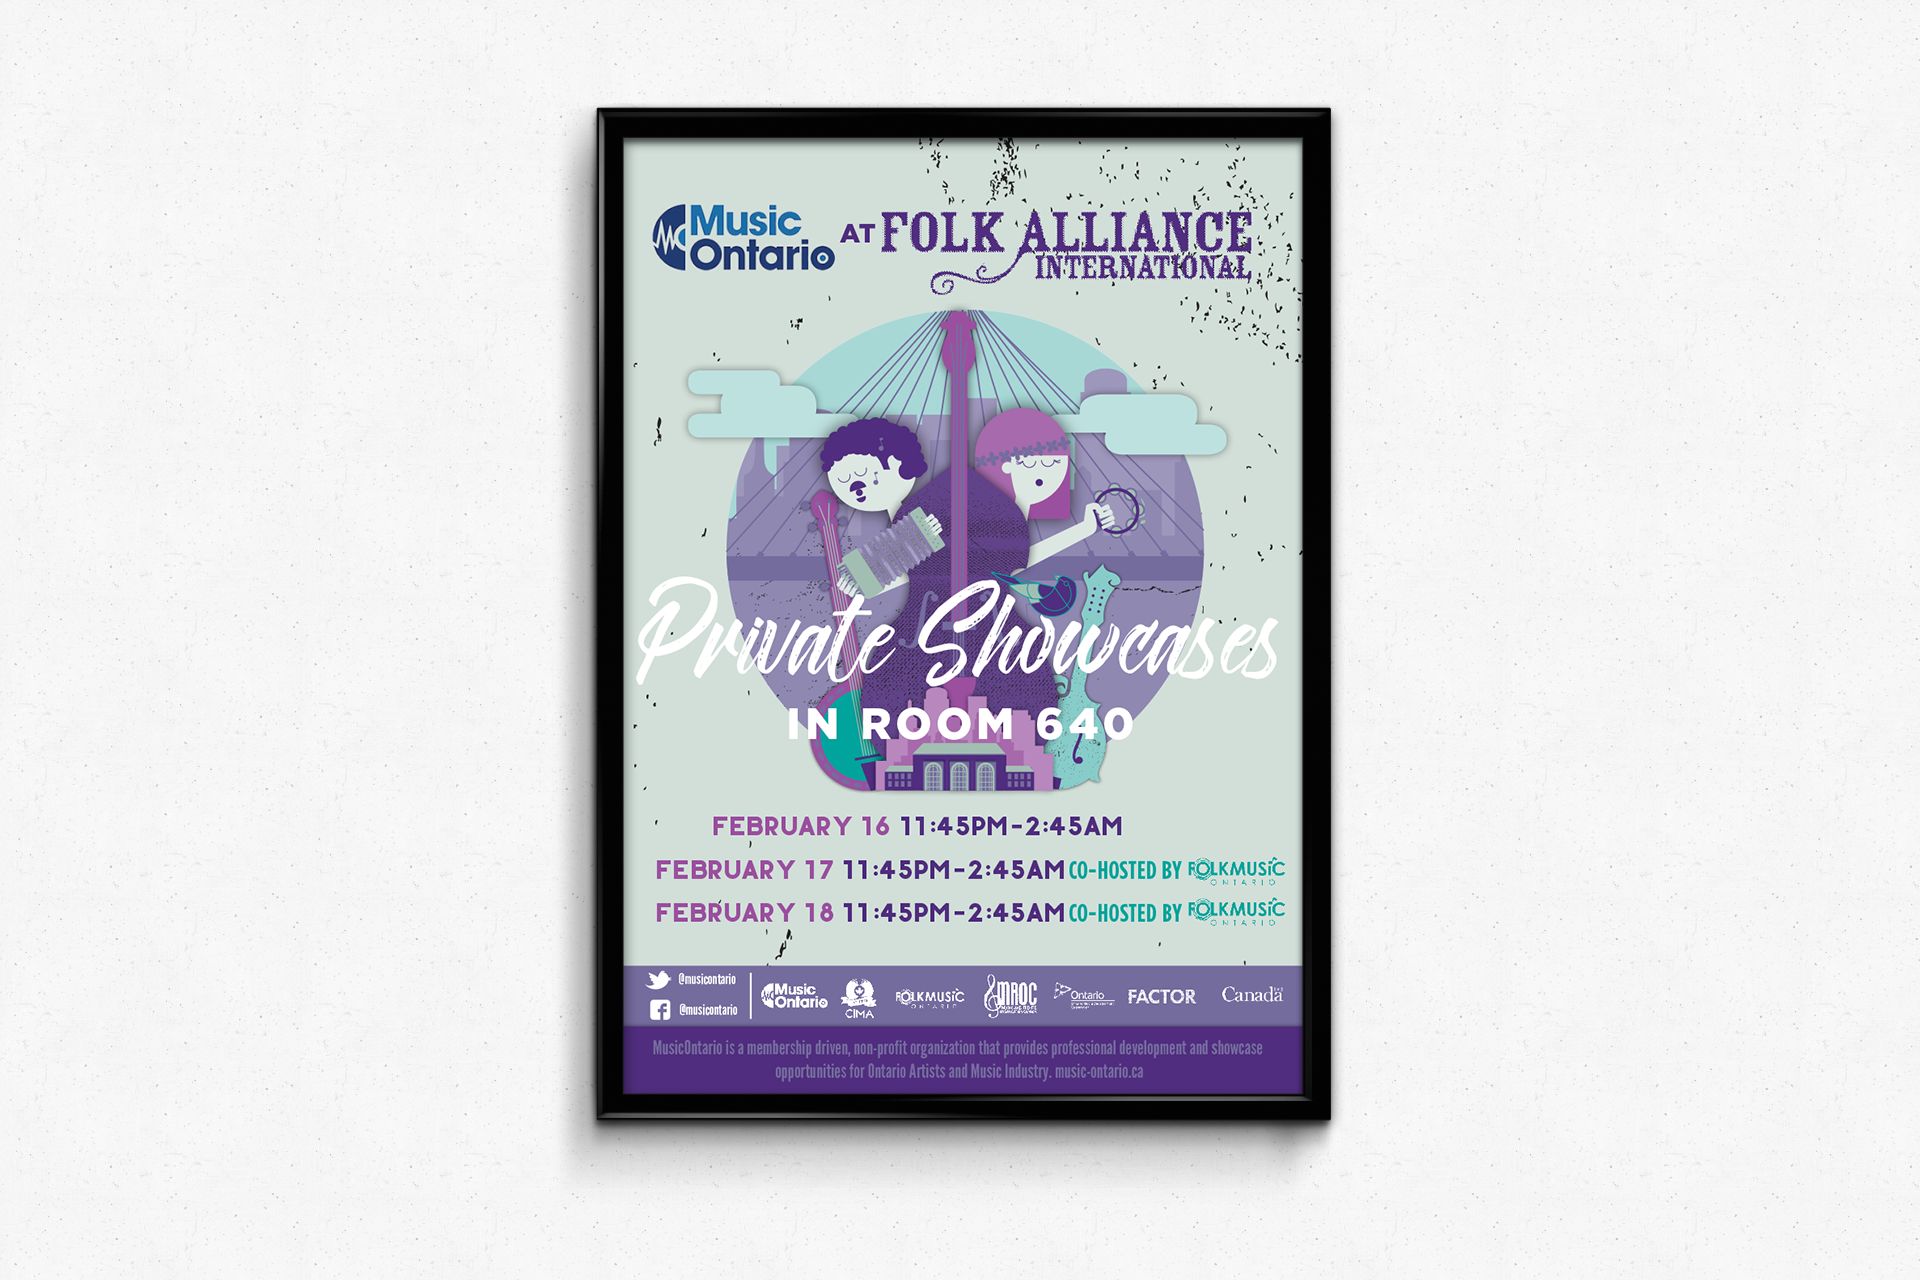 MusicOntario at Folk Alliance 2017